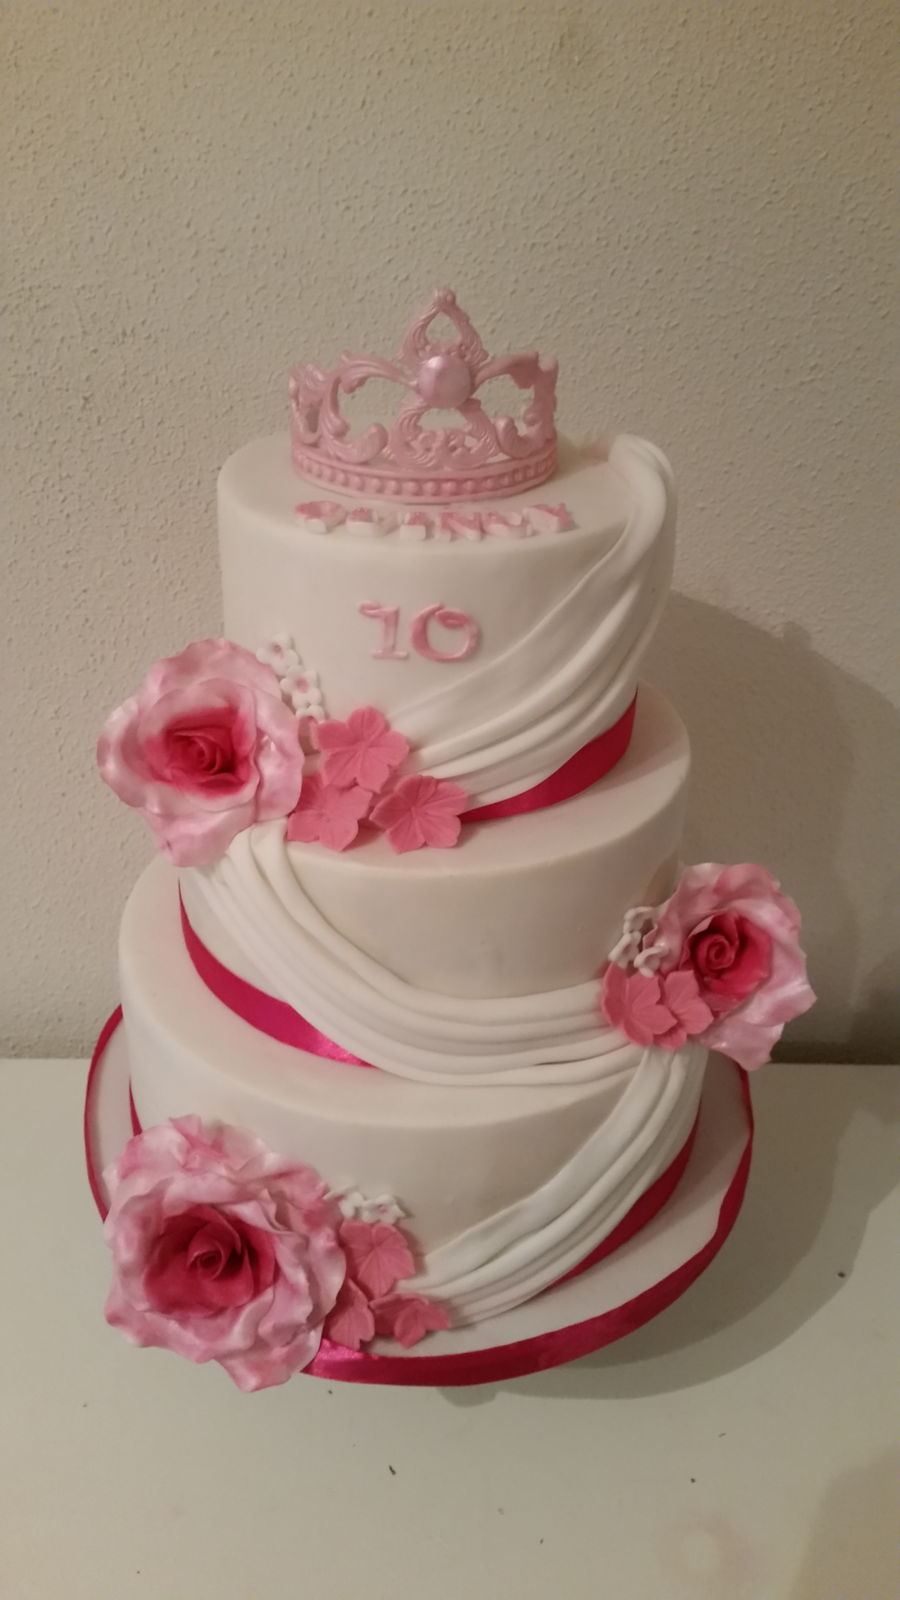 13 Animals Birthday Cakes For Girls 10th Birthday Photo Girls 10th